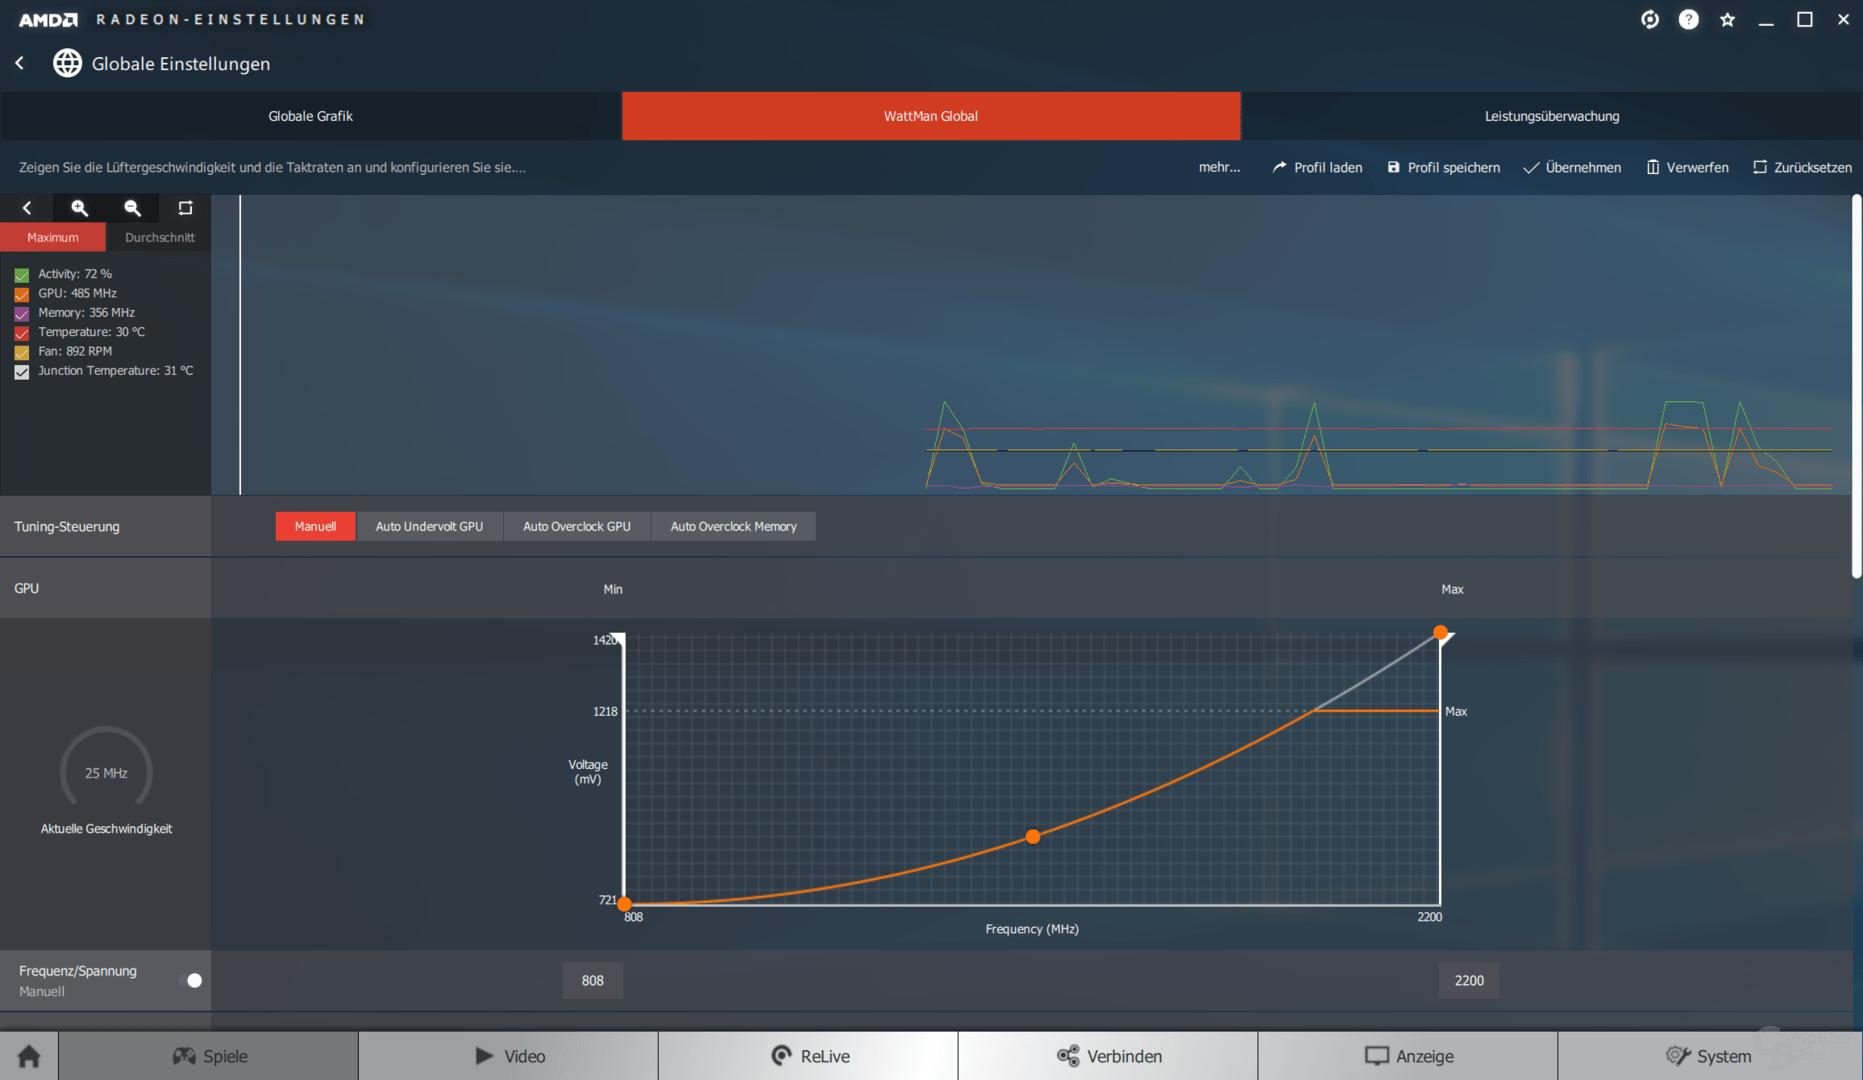 Radeon VII – WattMan bei maximiertem GPU-Takt